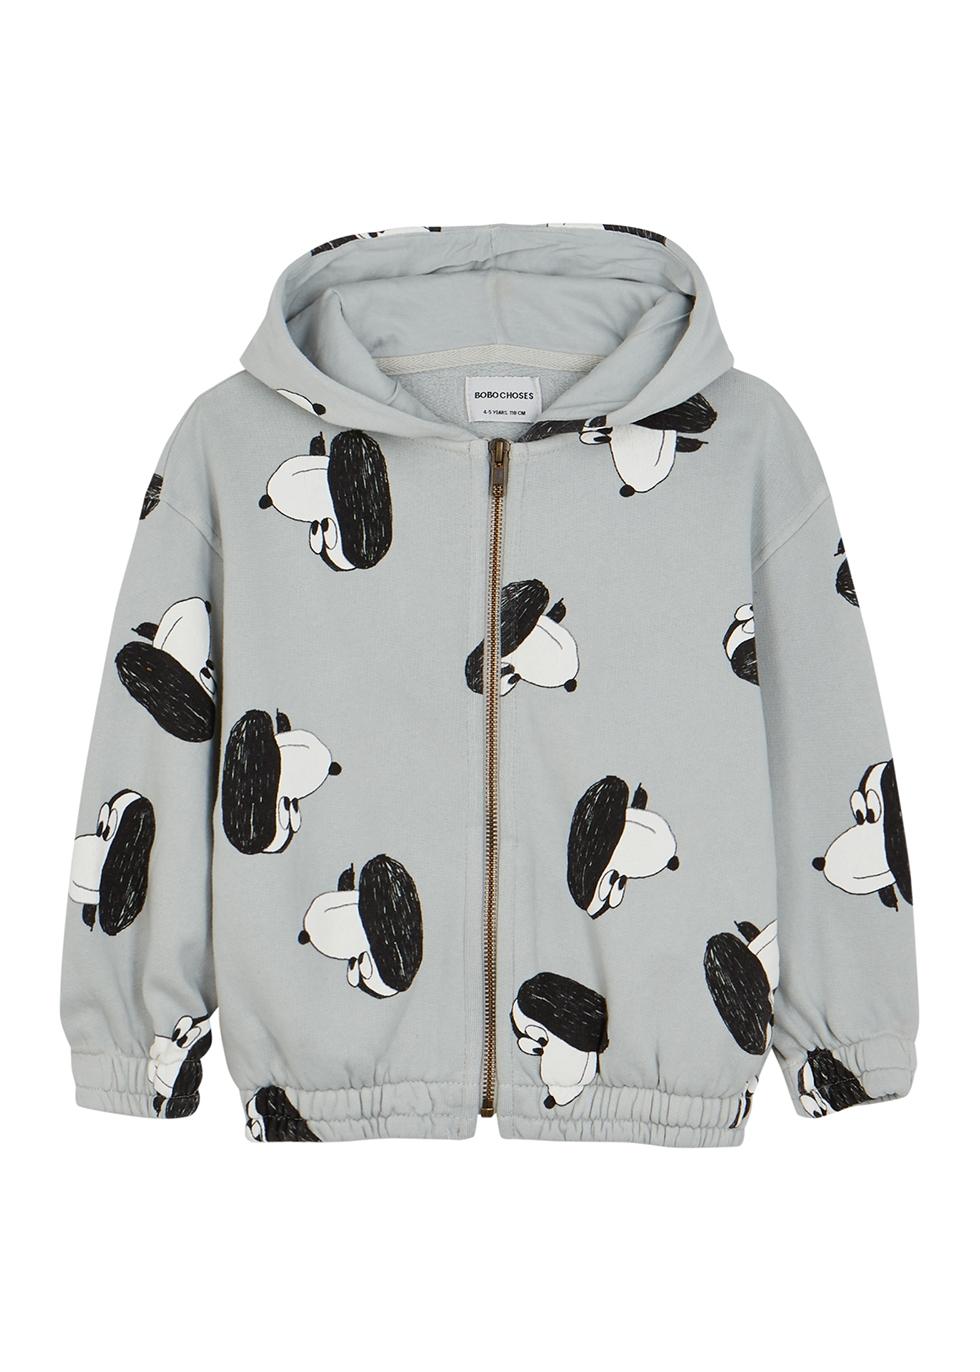 Doggie printed hooded cotton sweatshirt